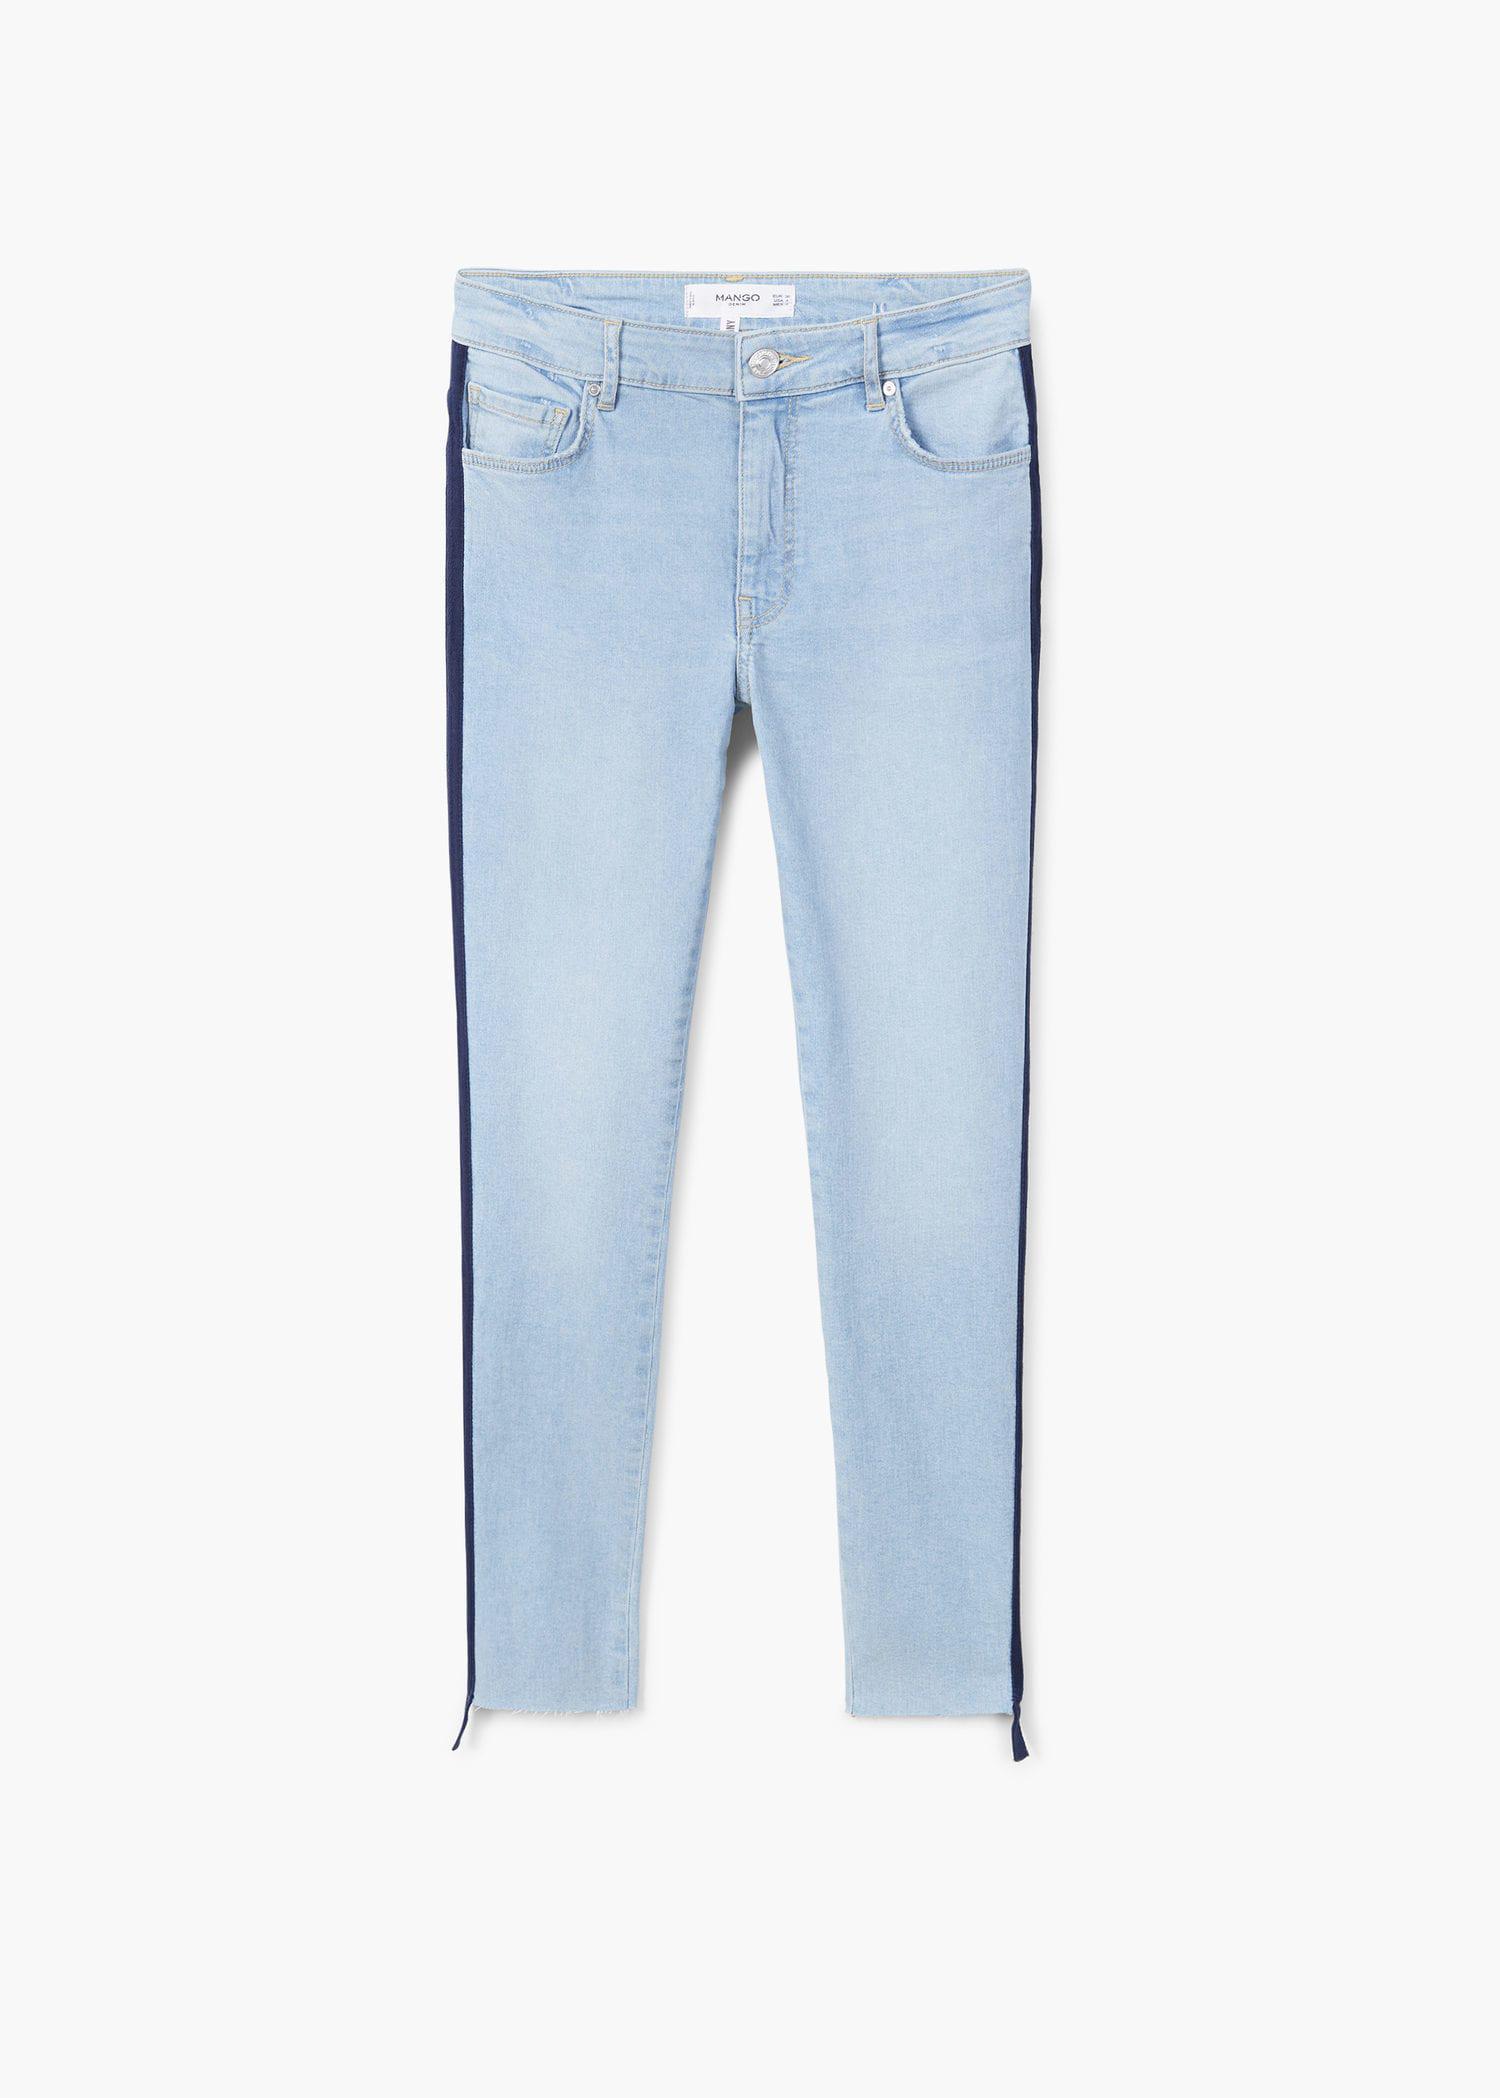 Mango Denim Cropped Skinny Jeans in Light Blue (Blue)